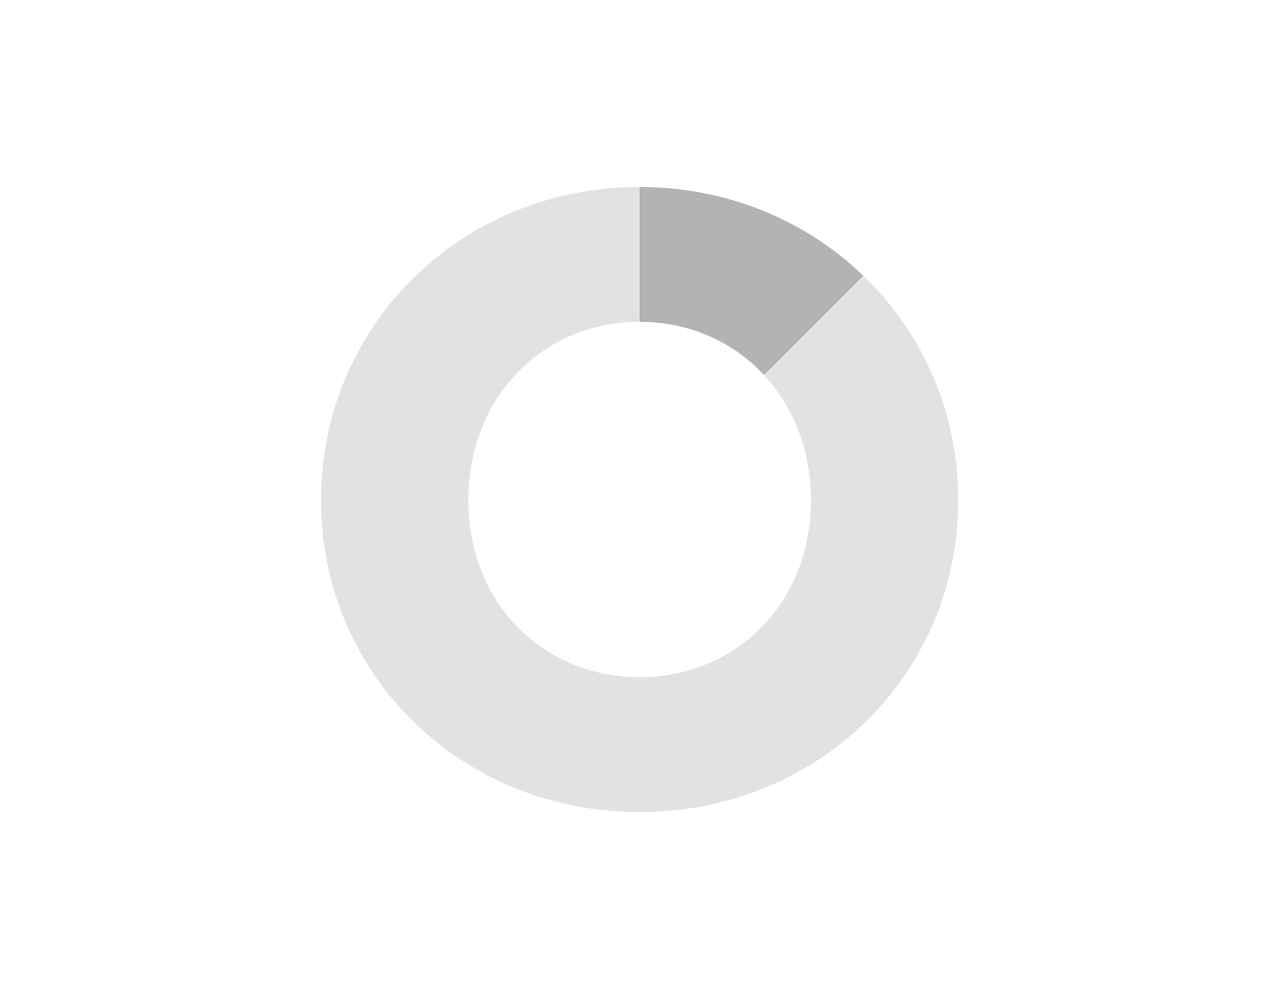 OSP-RTA-Melchsee-Frutt-2021-H_it